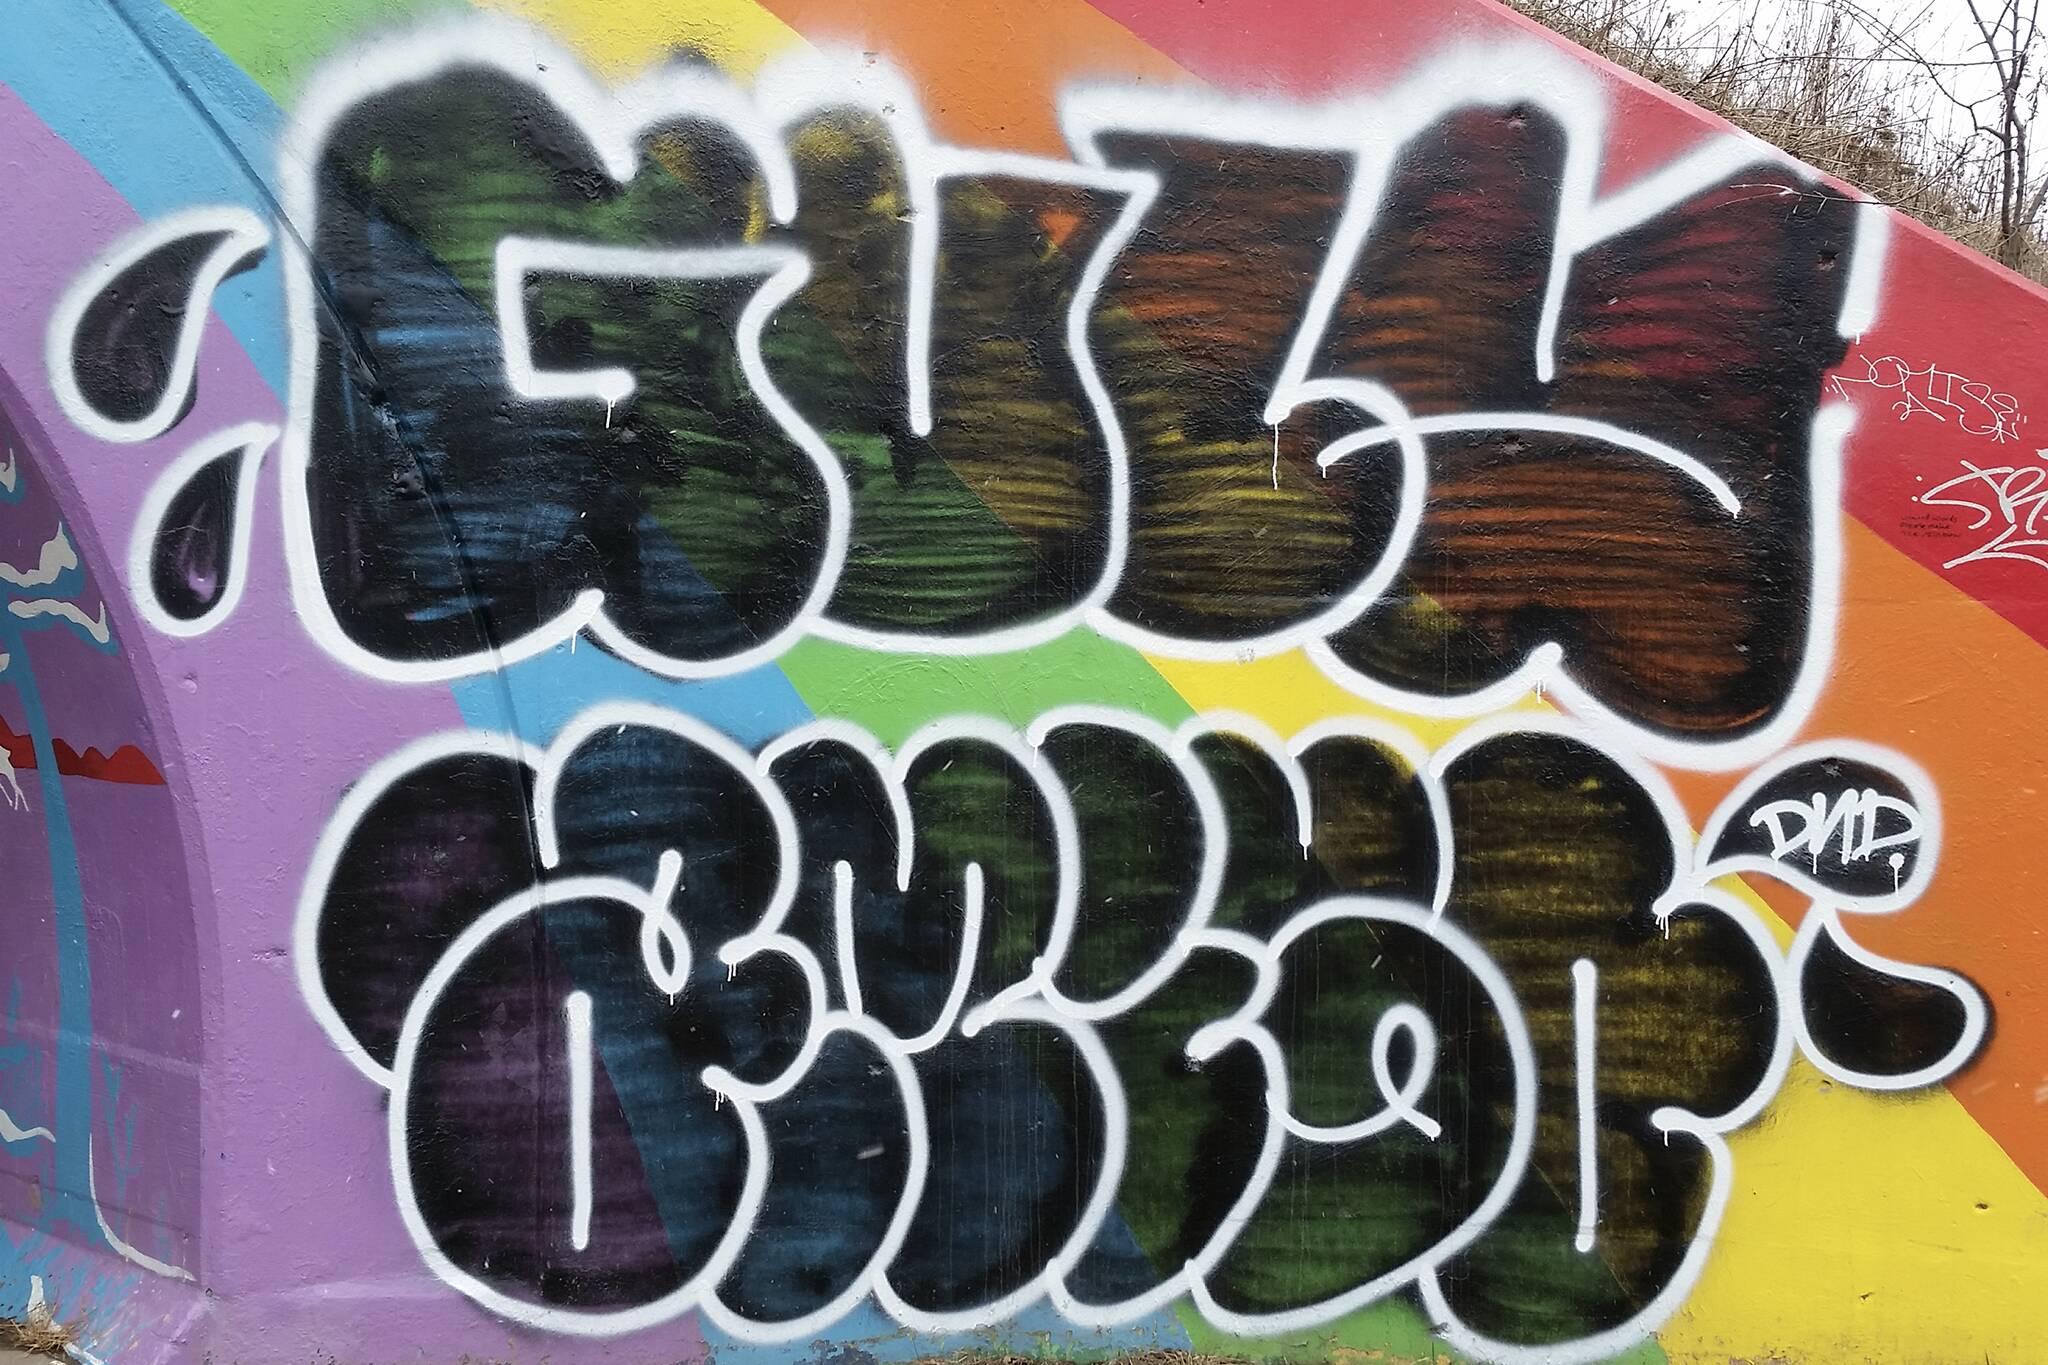 rainbow tunnel toronto